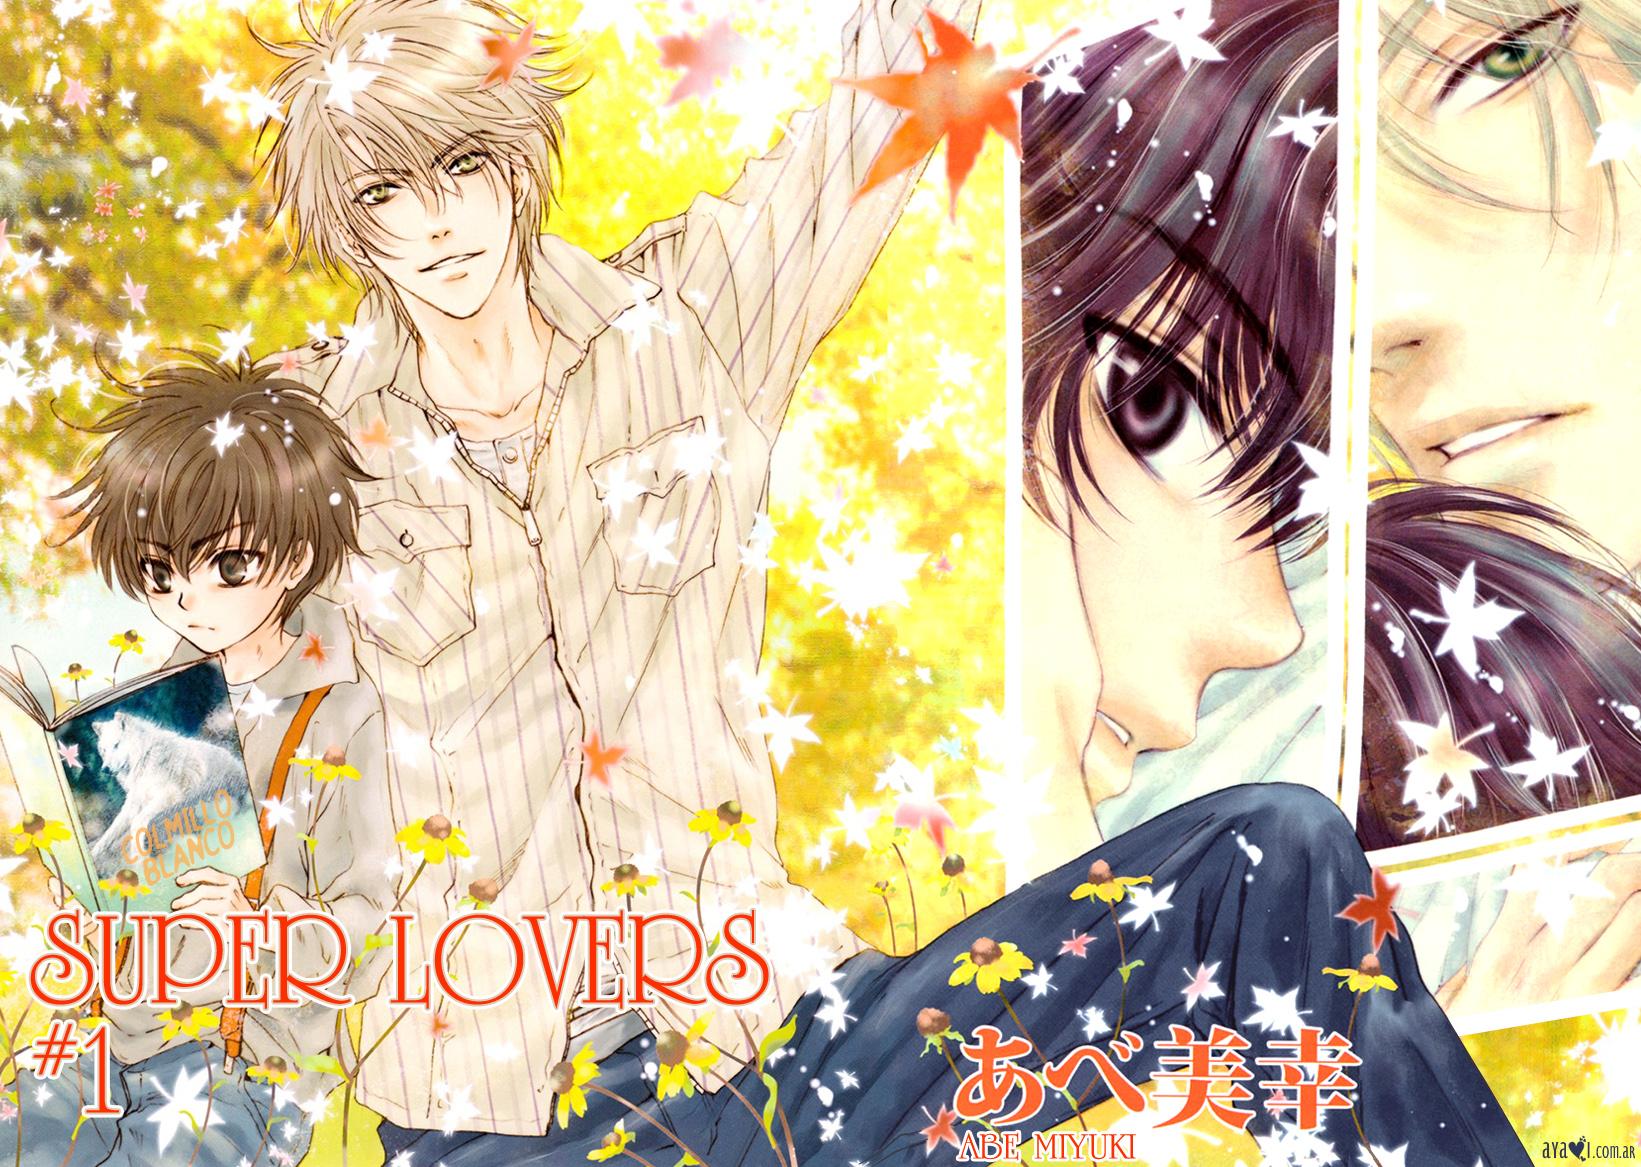 Super Lovers - Abe Miyuki - Zerochan Anime Image Board